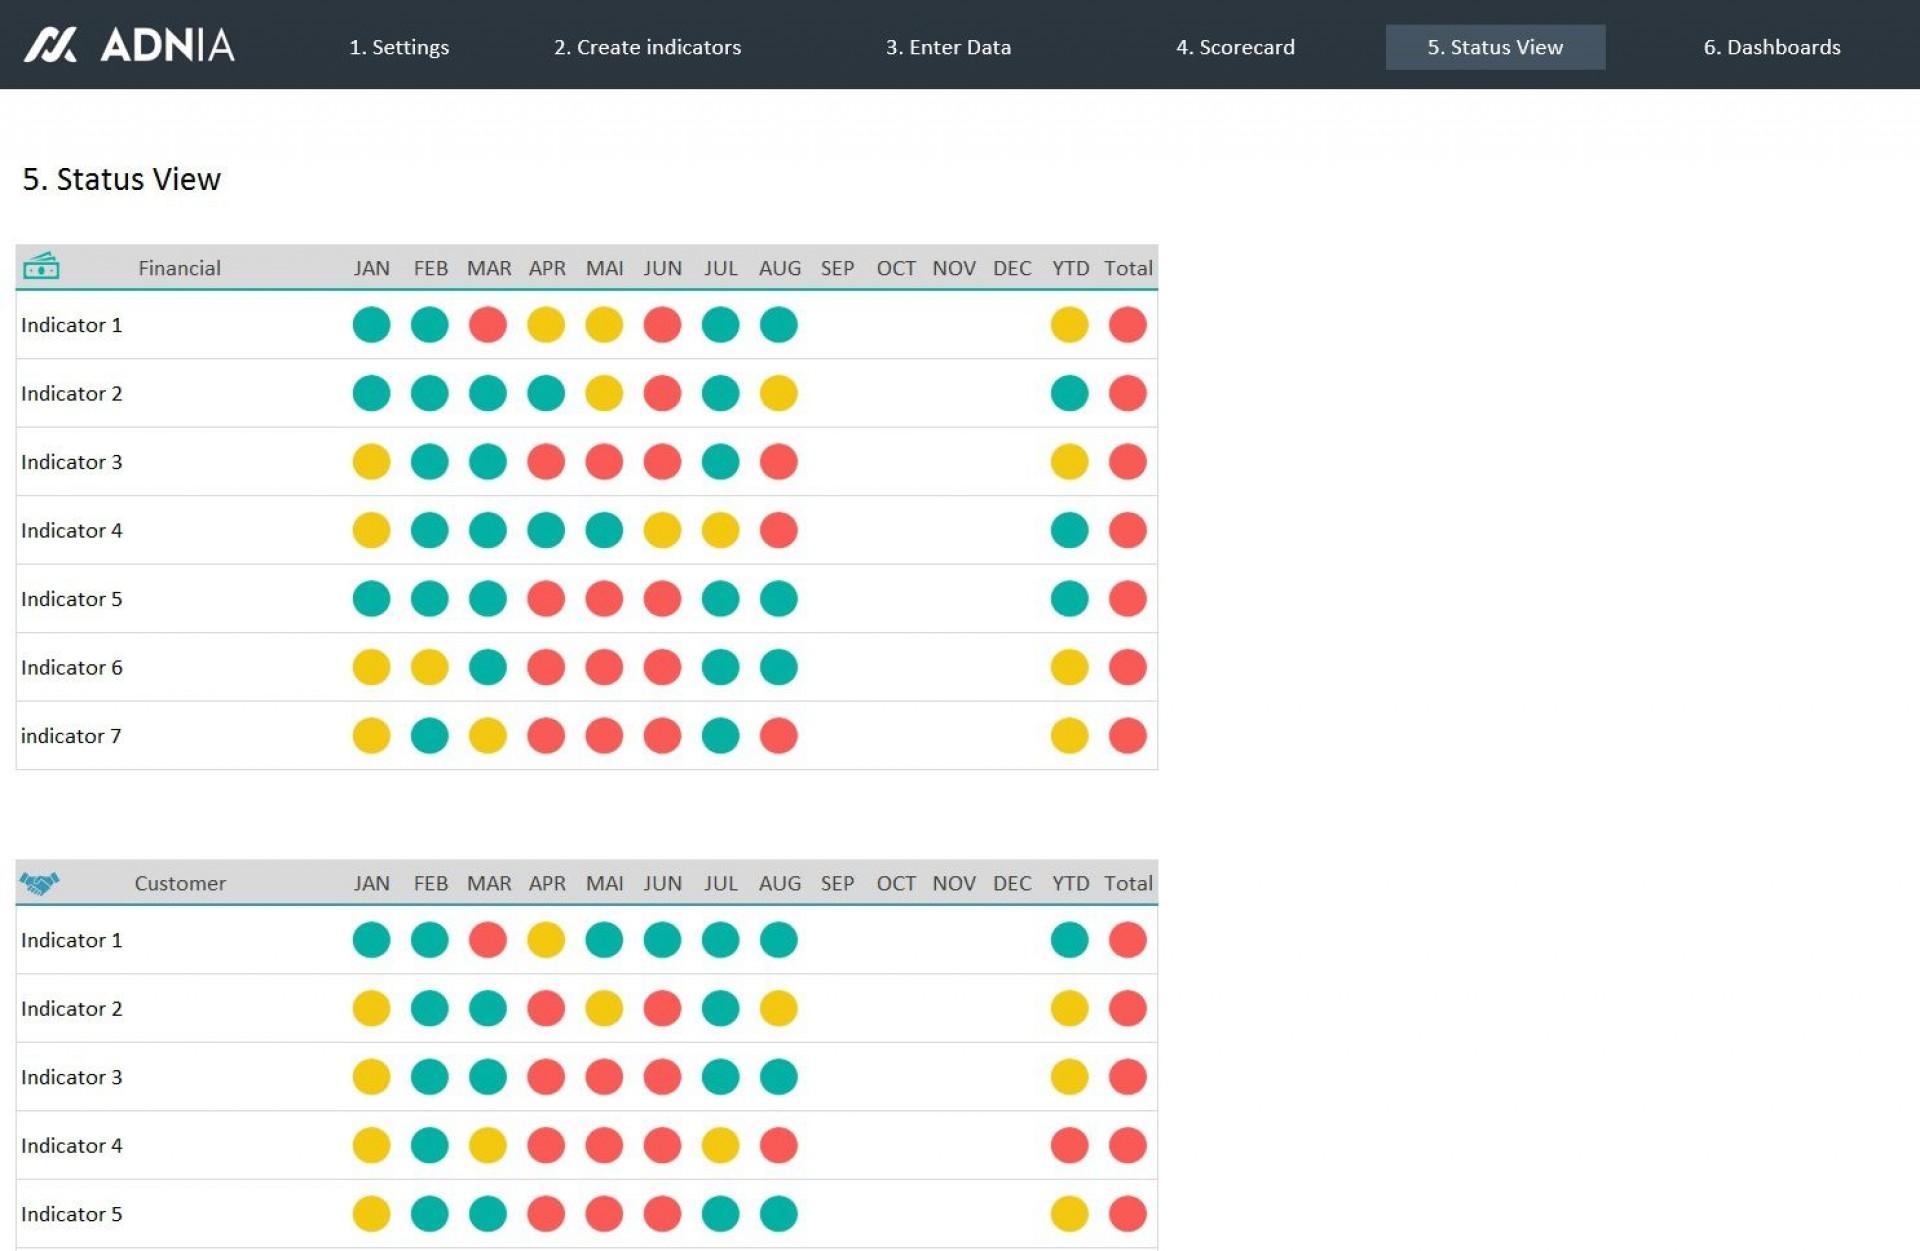 001 Surprising Balanced Scorecard Excel Template Highest Quality  Dashboard Download Hr1920